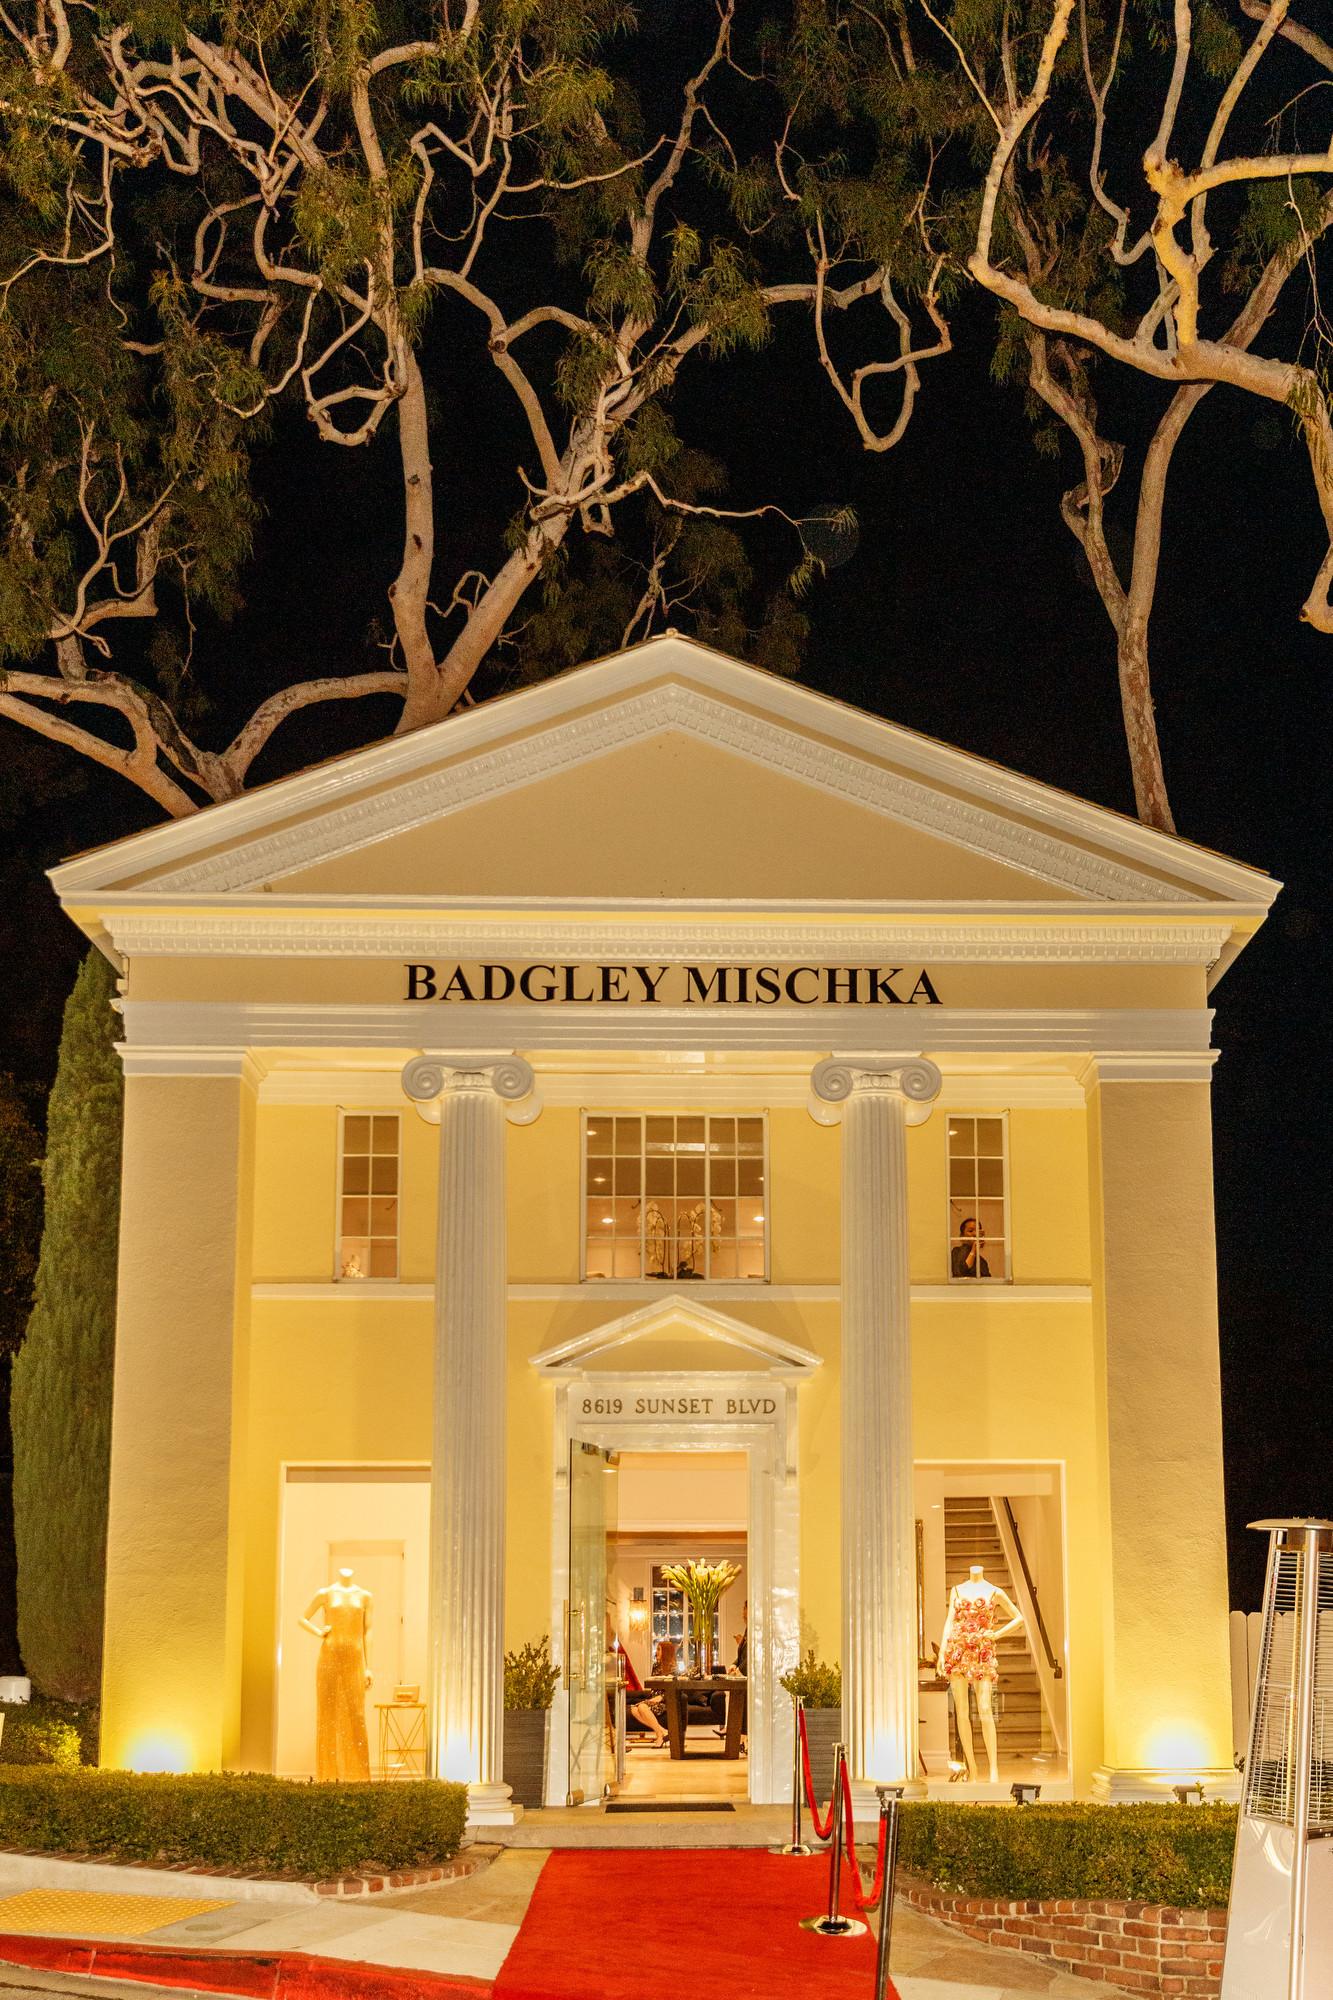 Badgley Mischka Hosts Opening Night Celebration At New Flagship Store